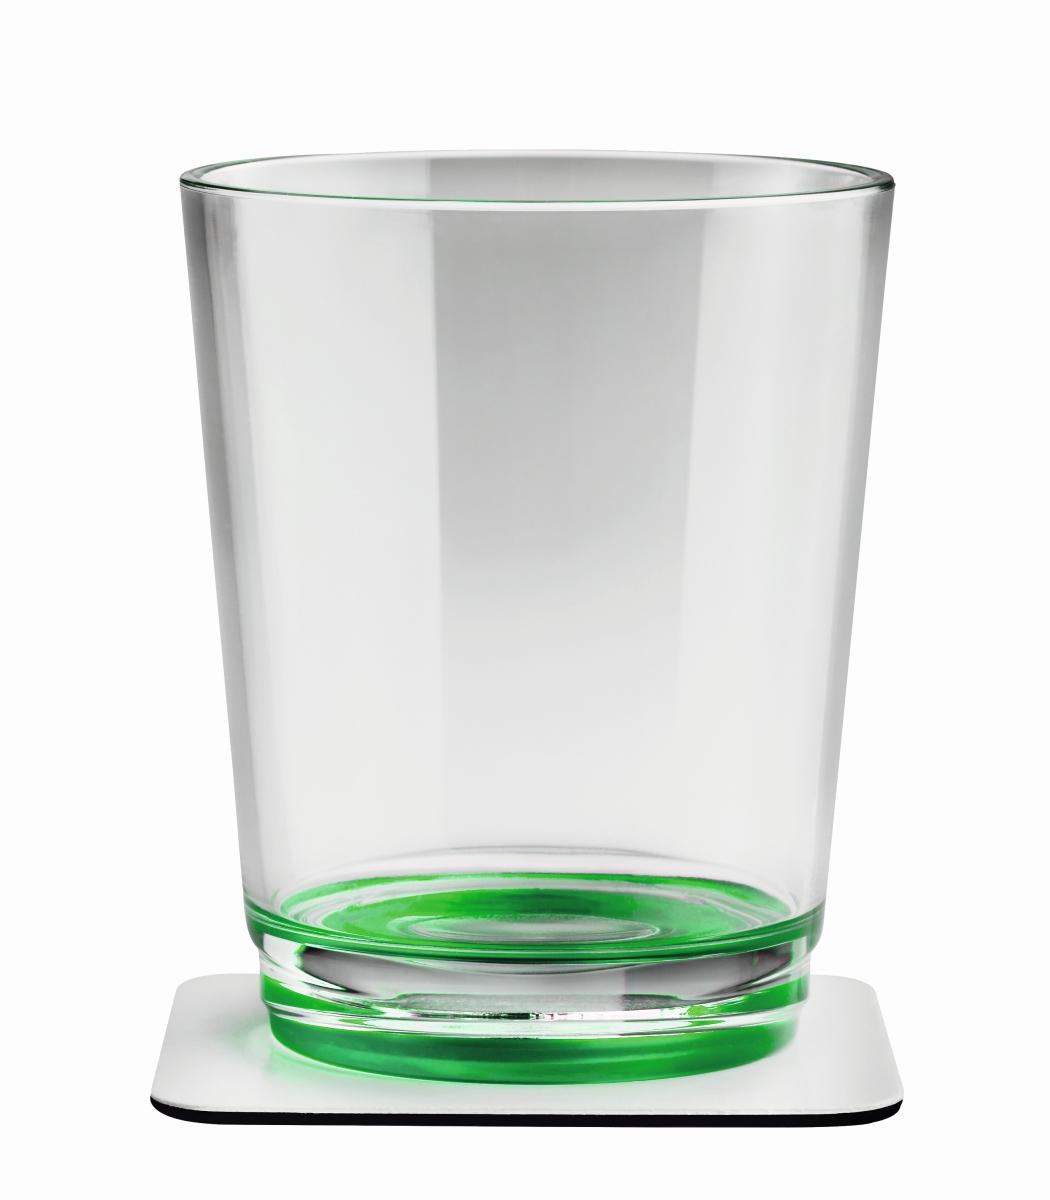 Silwy Glas 2er-Set SOUR GREEN